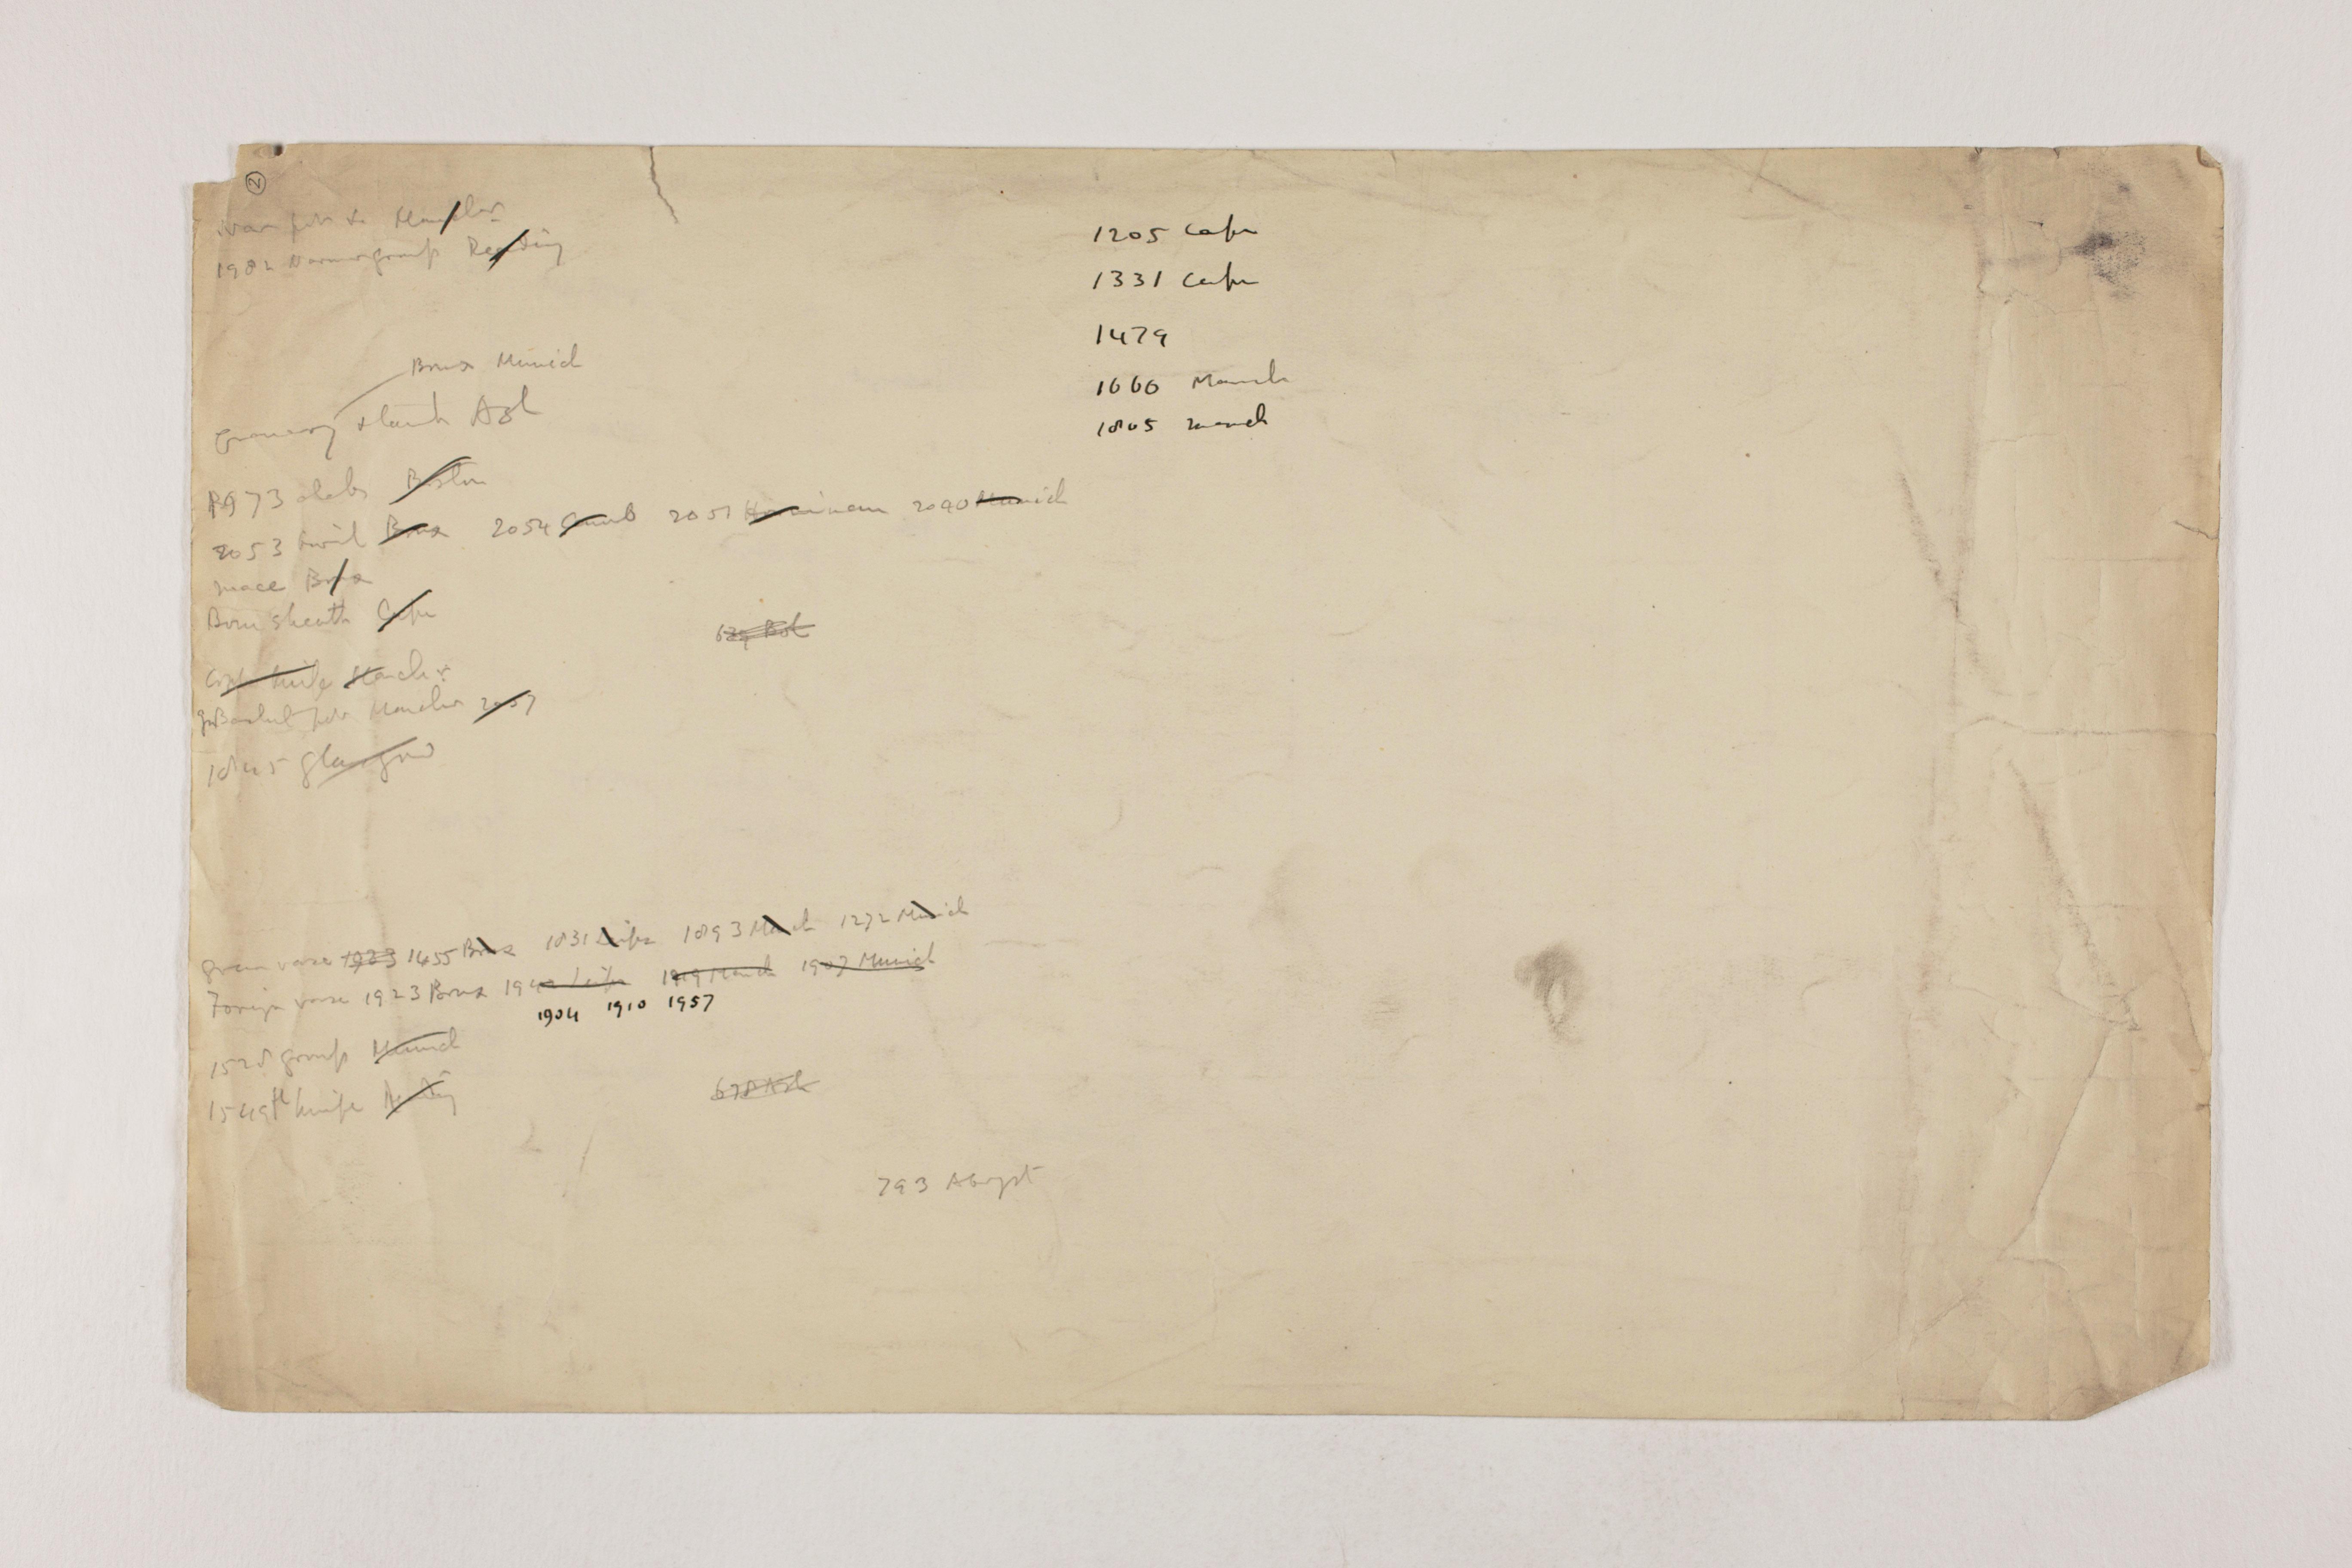 1913-14 Lahun, Haraga Object list PMA/WFP1/D/22/2.2